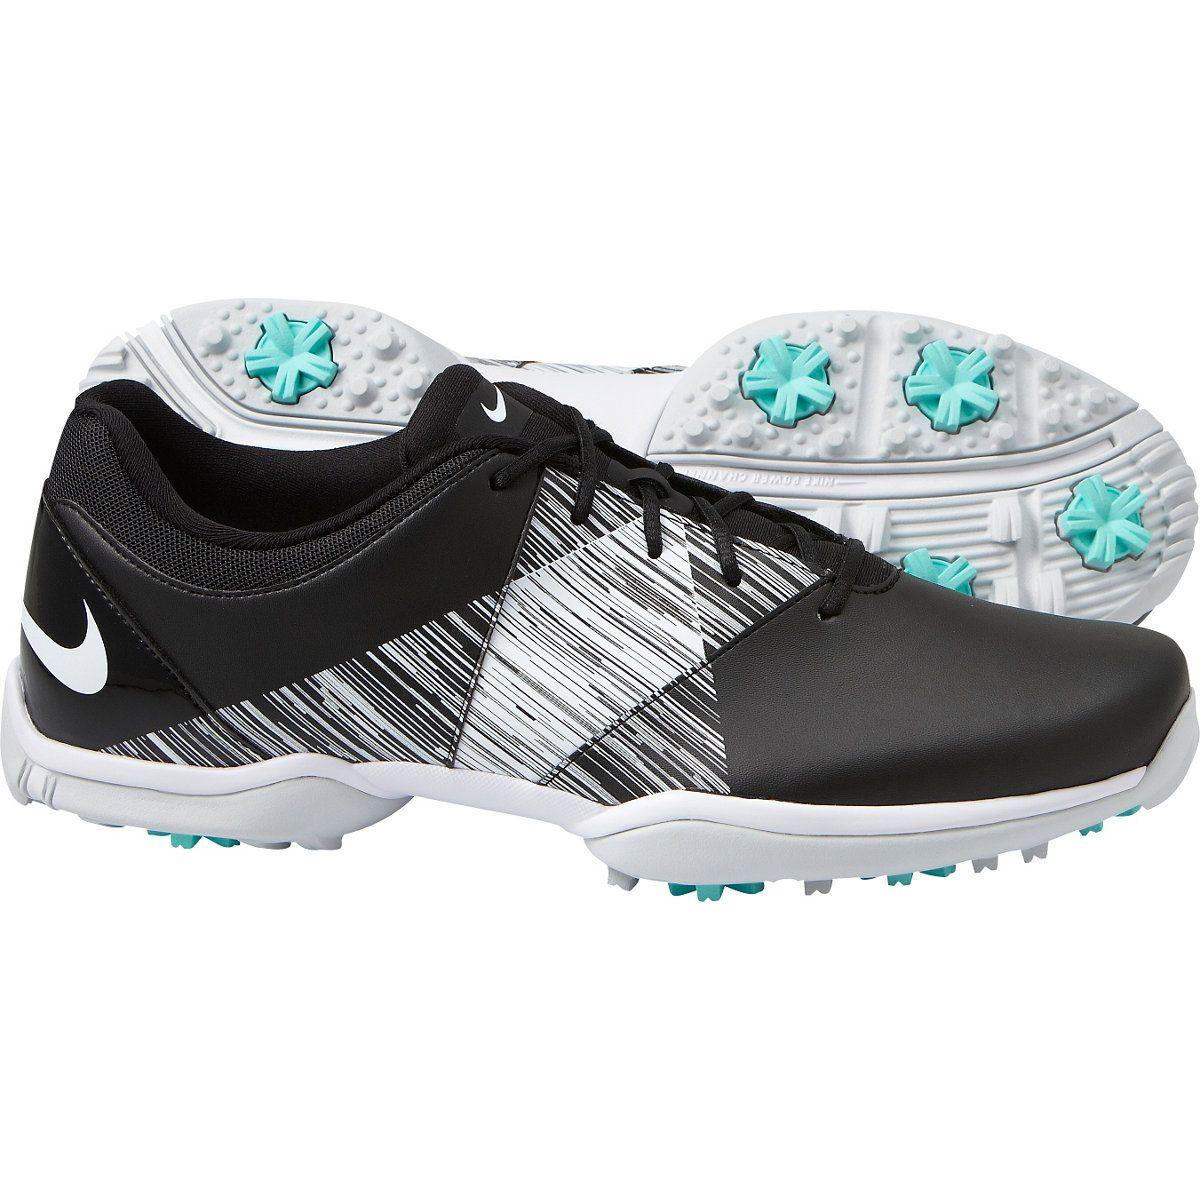 Golfsmith Nike Shoes